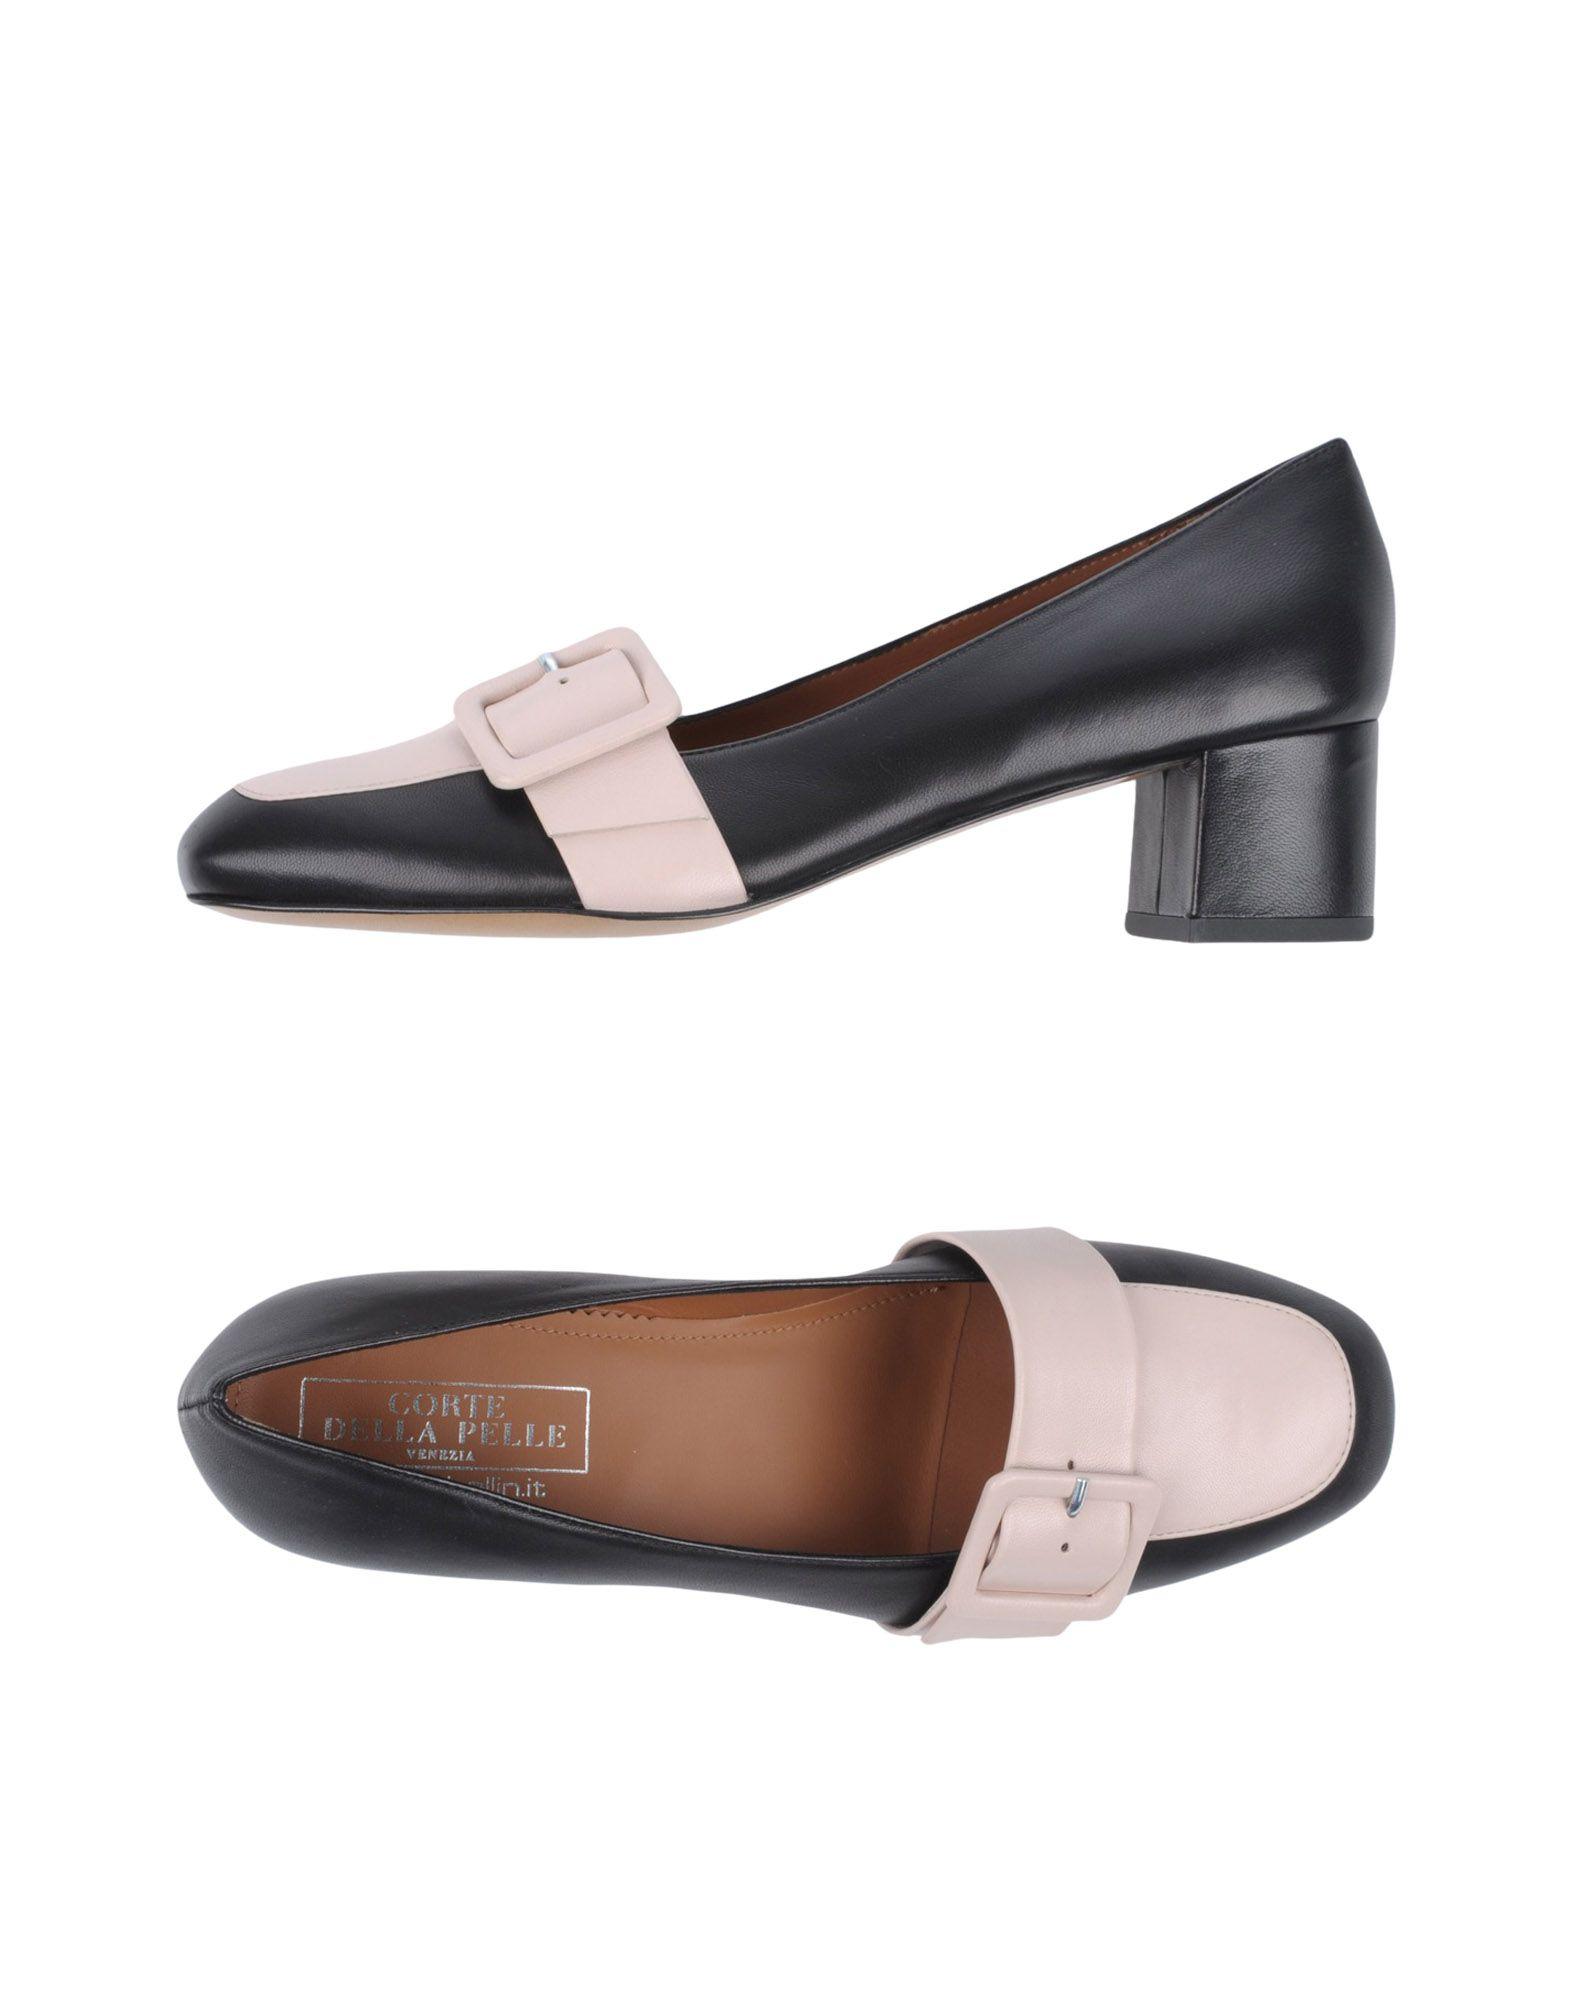 La Corte Della Pelle By Franco Ballin Mokassins Damen  11374865PP Gute Qualität beliebte Schuhe